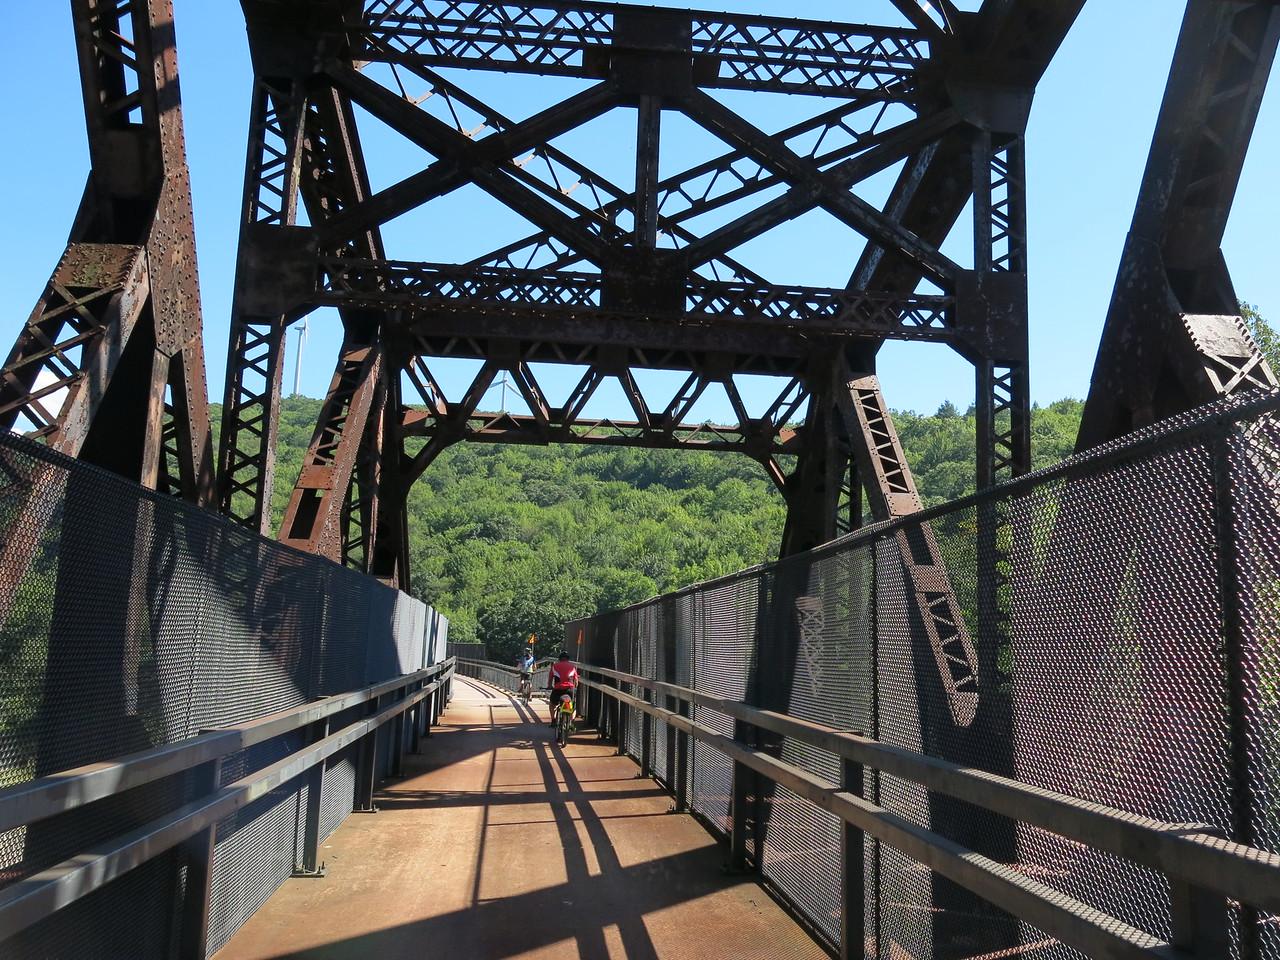 Leaving the truss bridge section of Keystone Viaduct